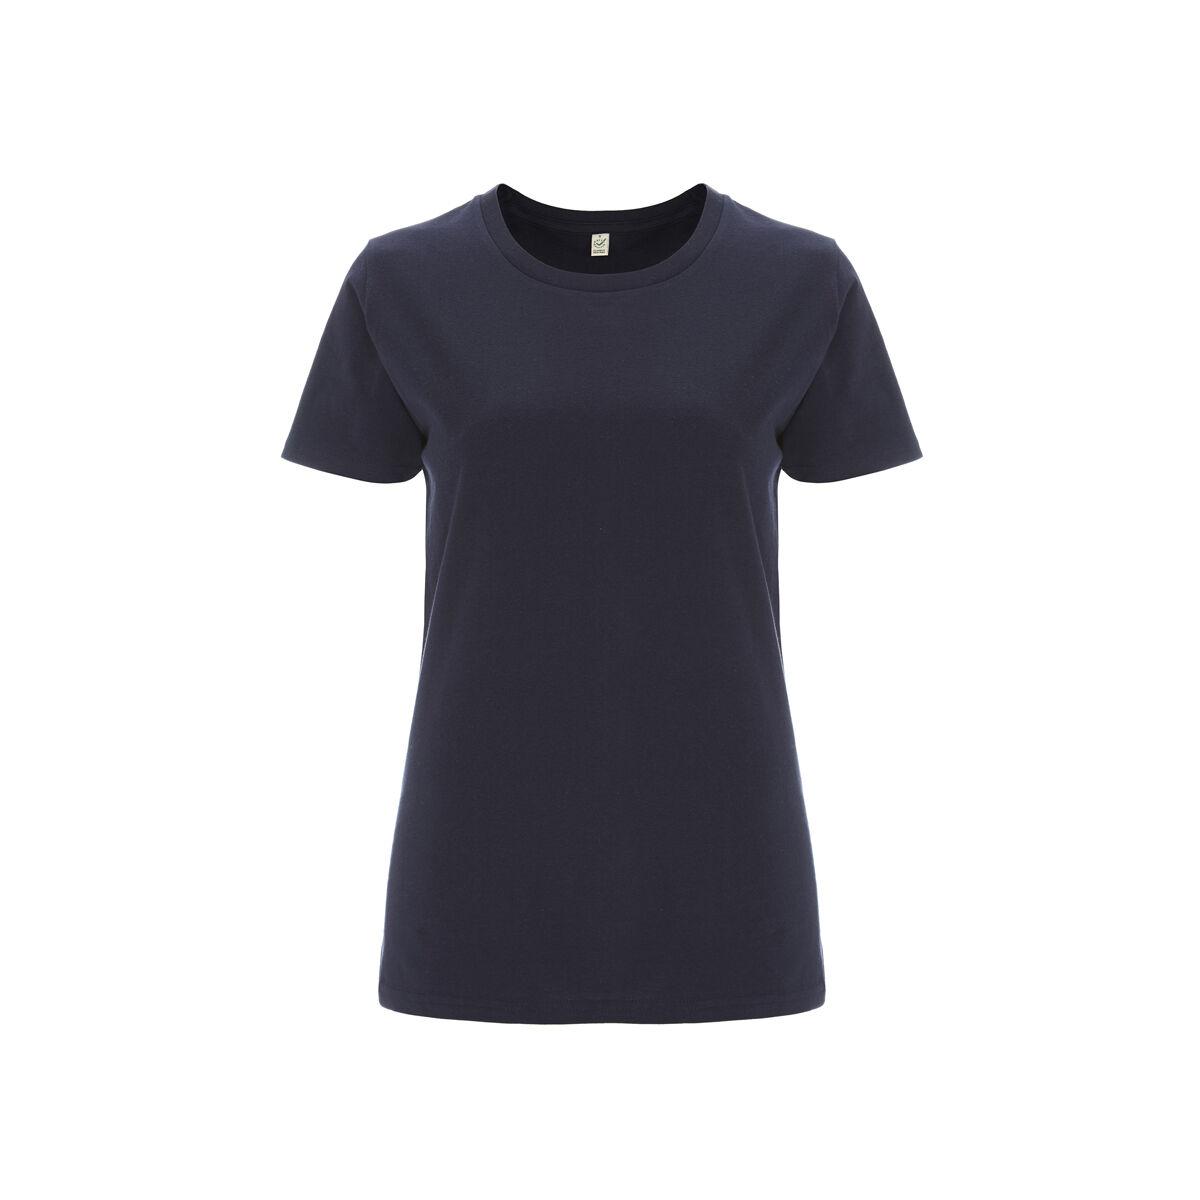 Organic Earth Positive Ladies T-Shirts Blue